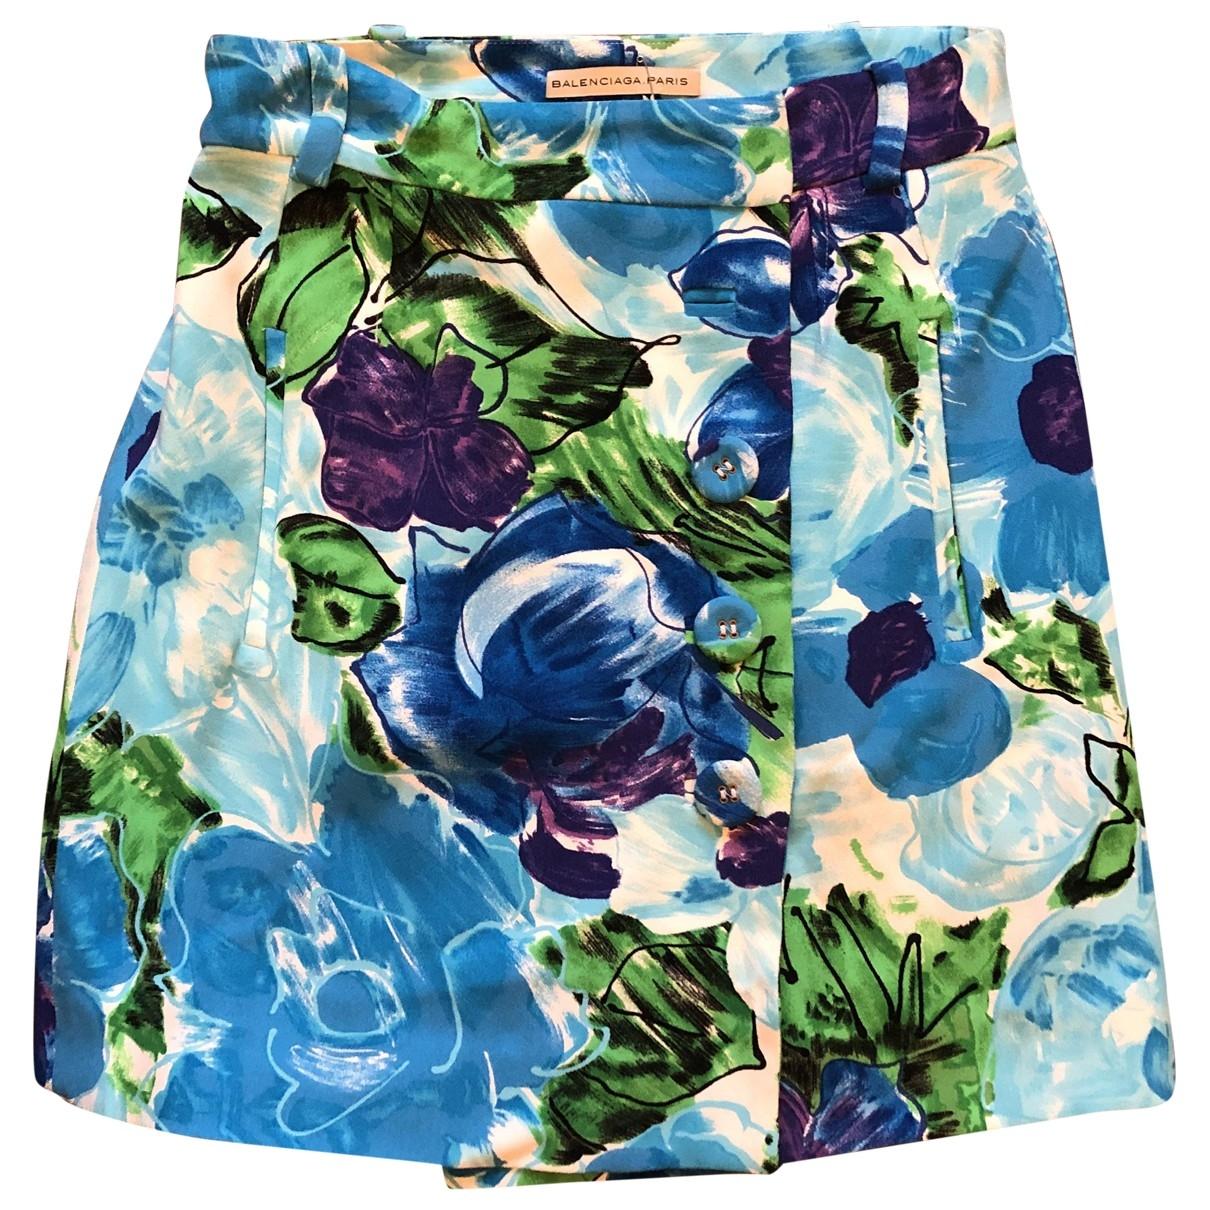 Balenciaga - Jupe   pour femme - multicolore